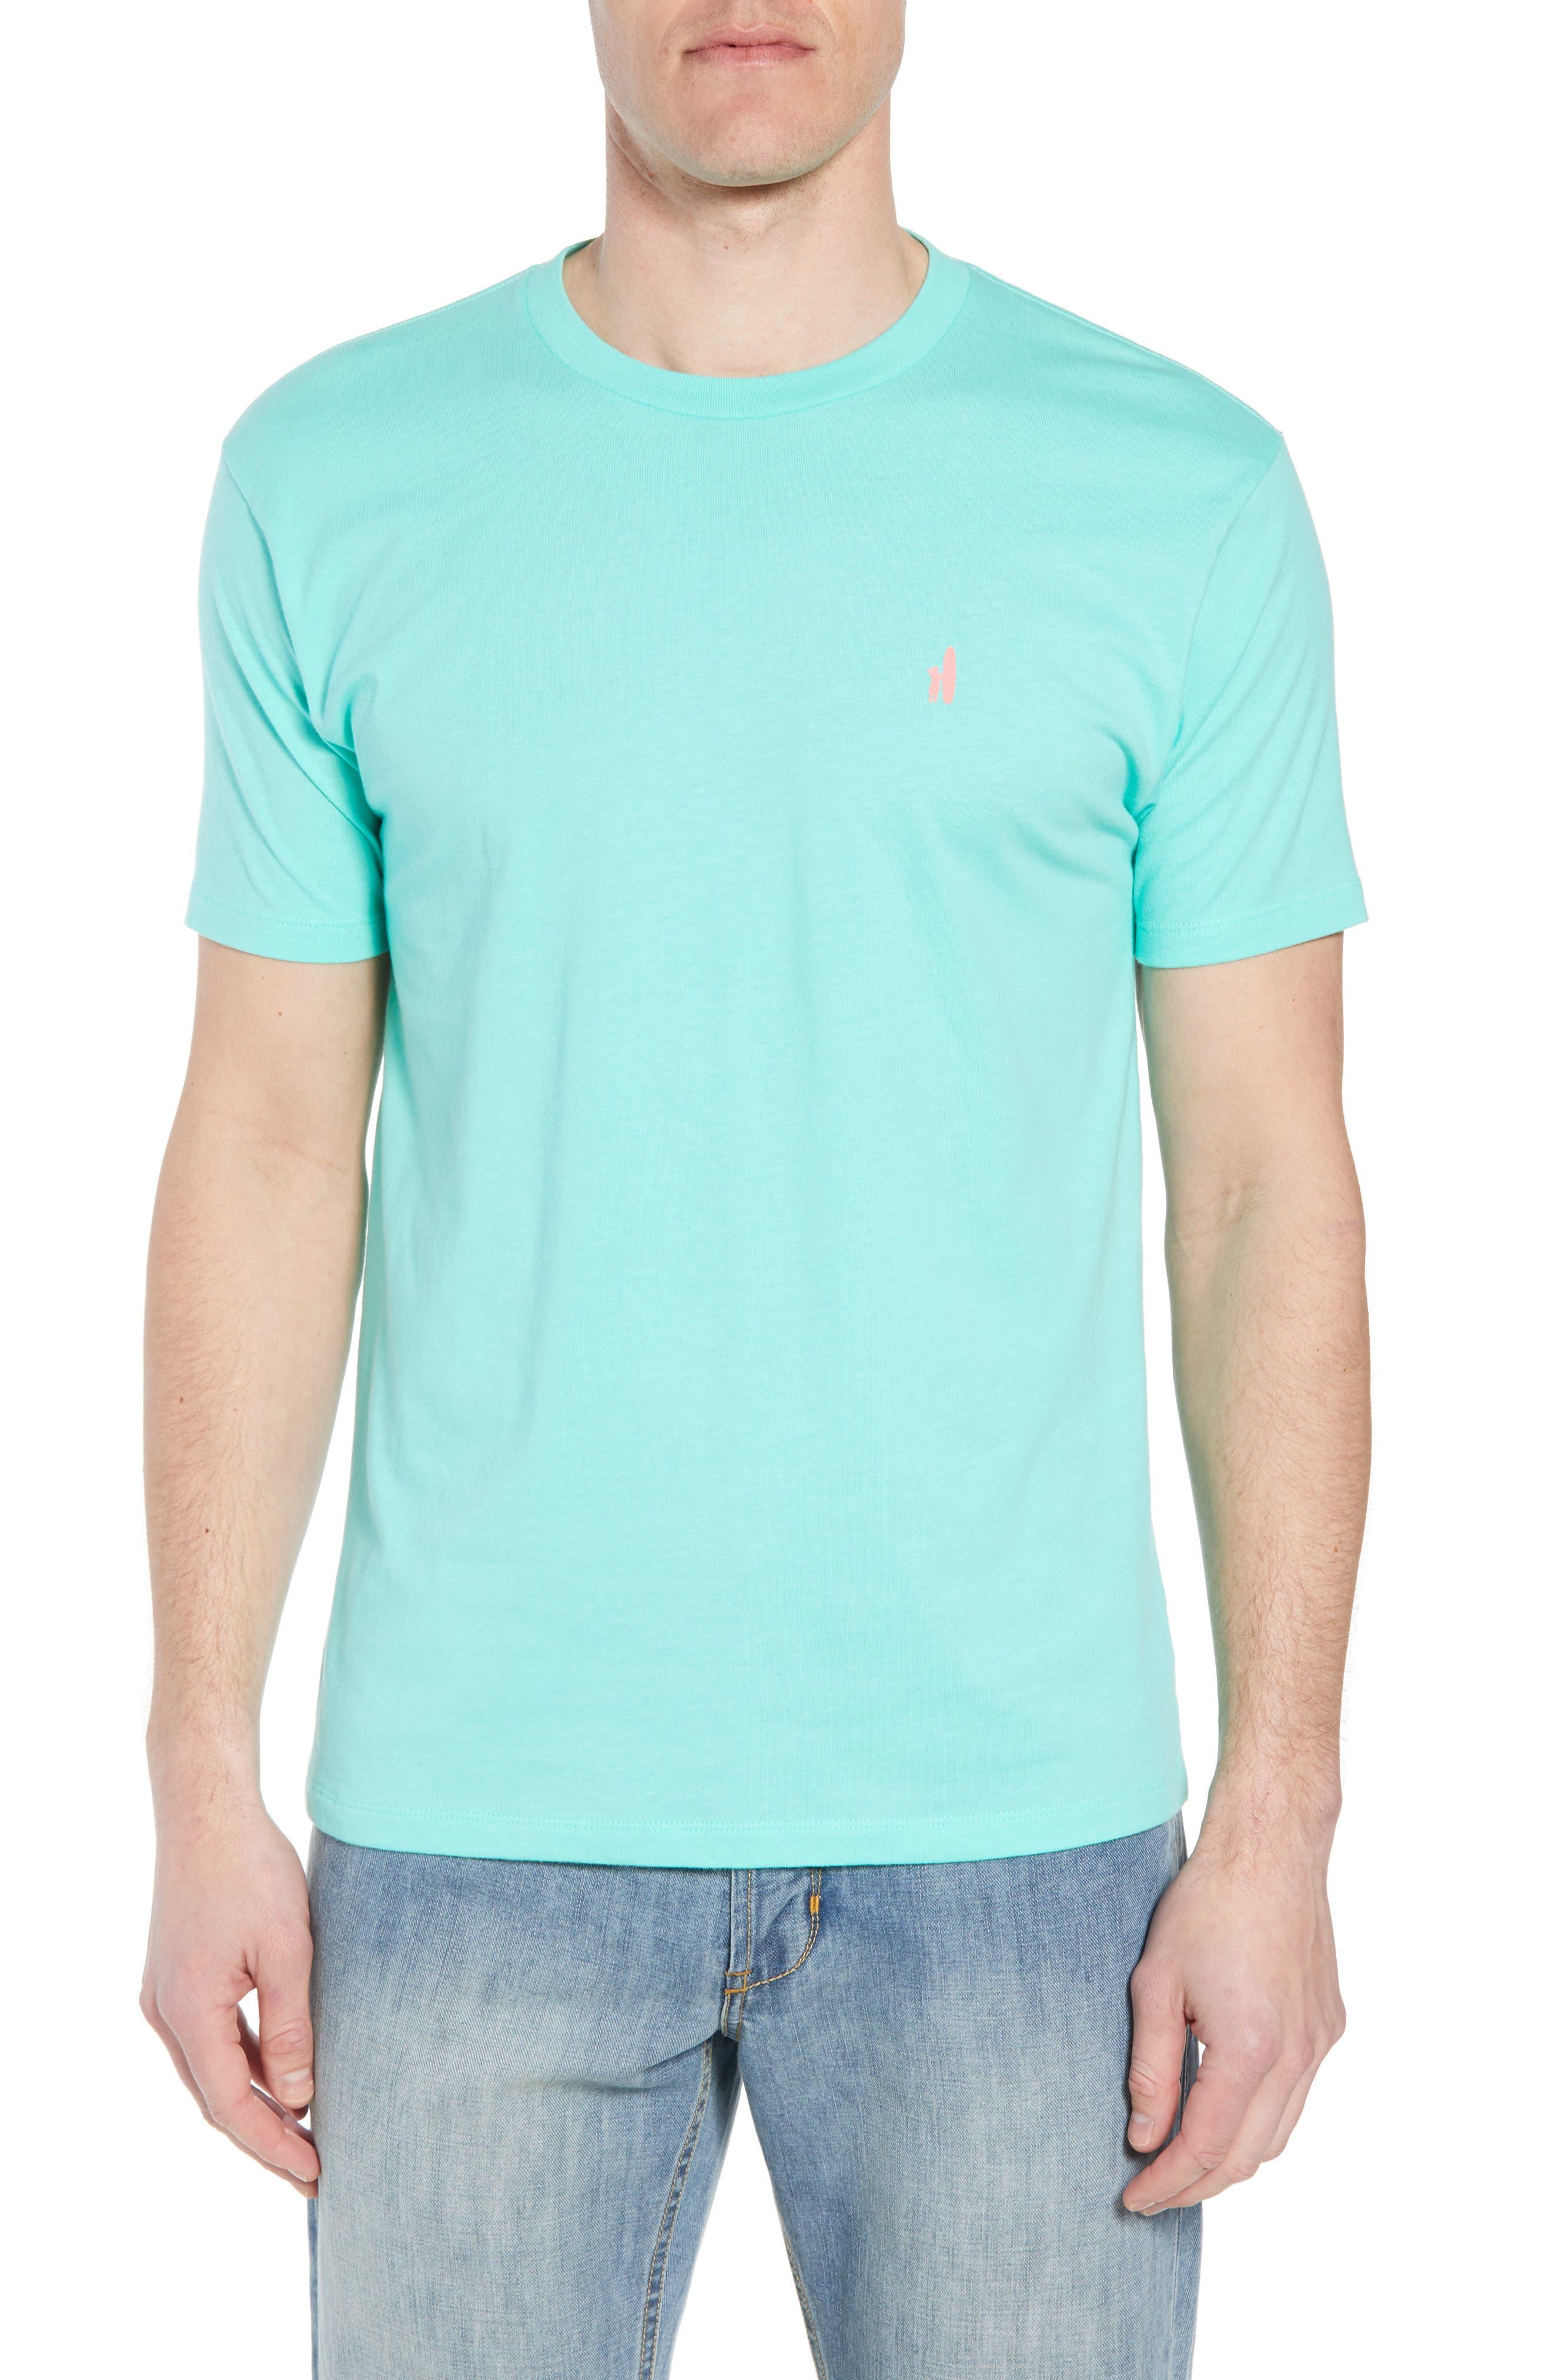 Vance Graphic T-Shirt,                         Main,                         color, Kiwi